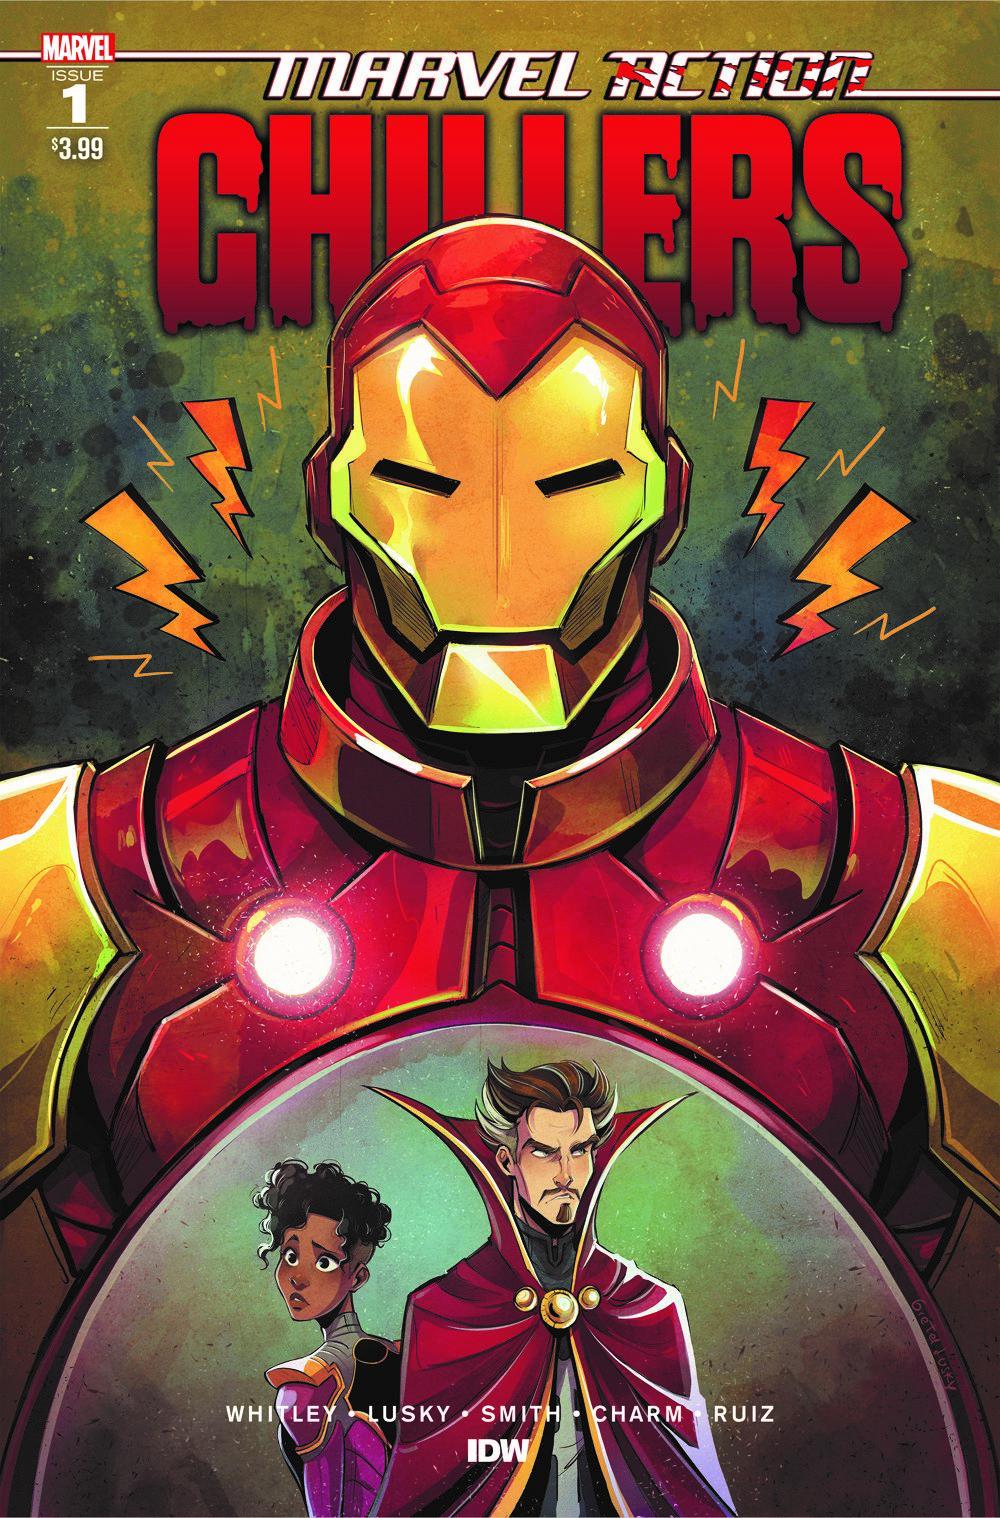 AvengersCHILLERS_01_CvrA ComicList Previews: MARVEL ACTION CHILLERS #1